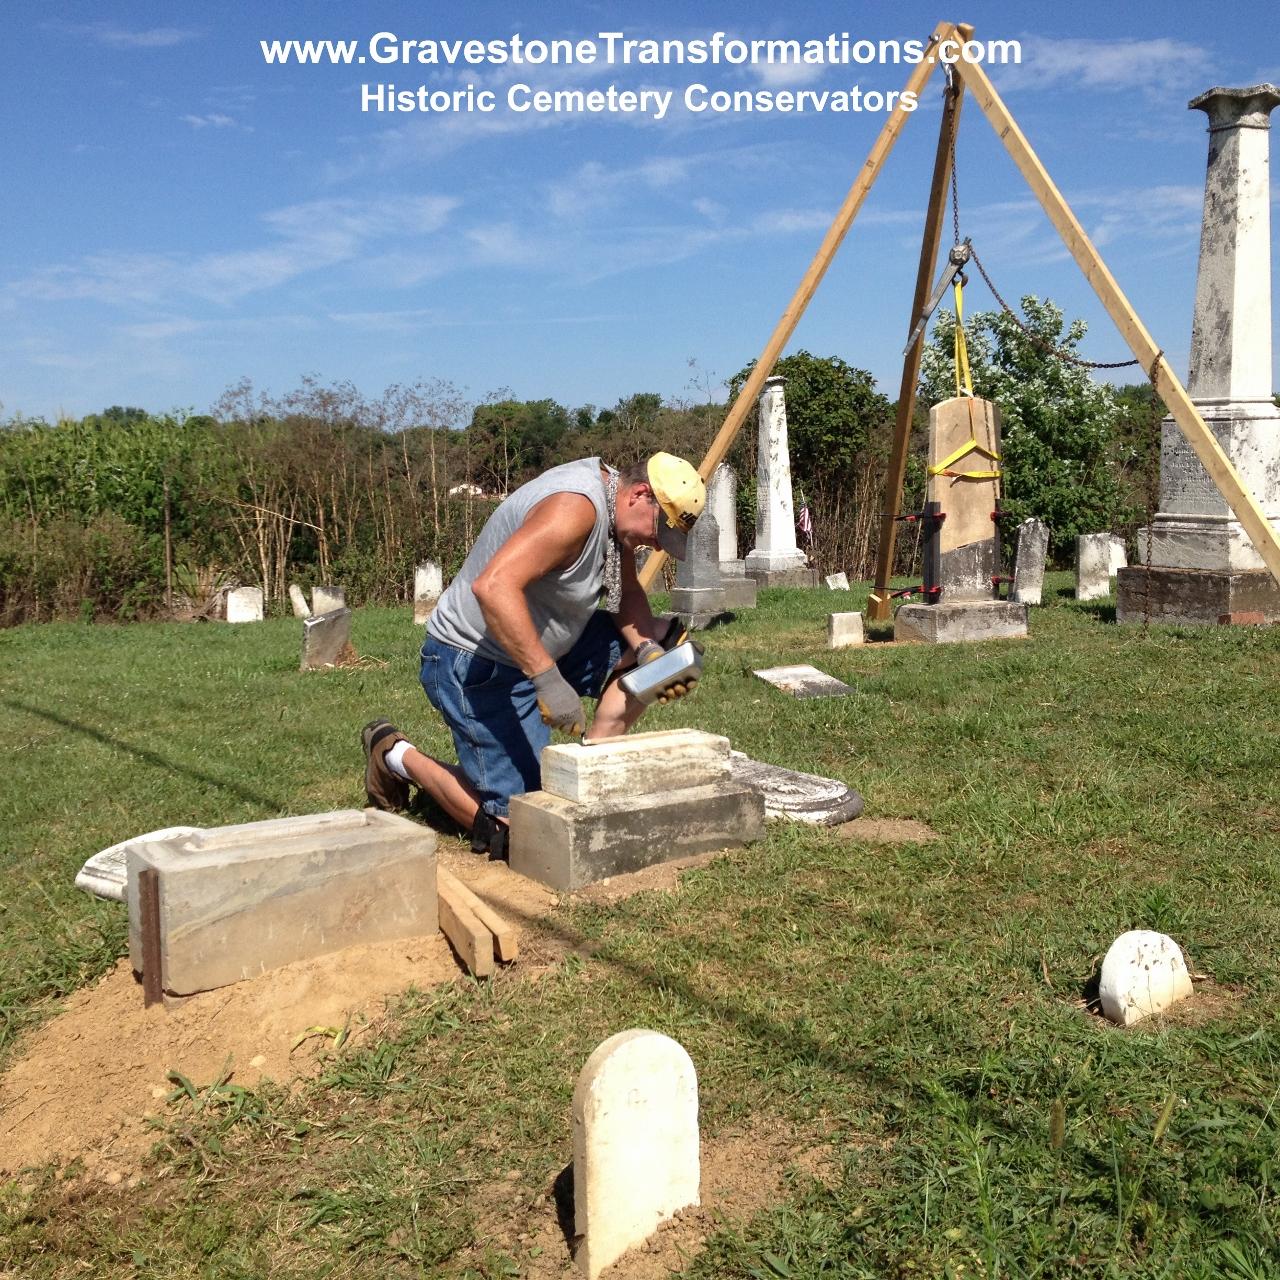 Gravestone Transformations - Historic Cemetery Conservators